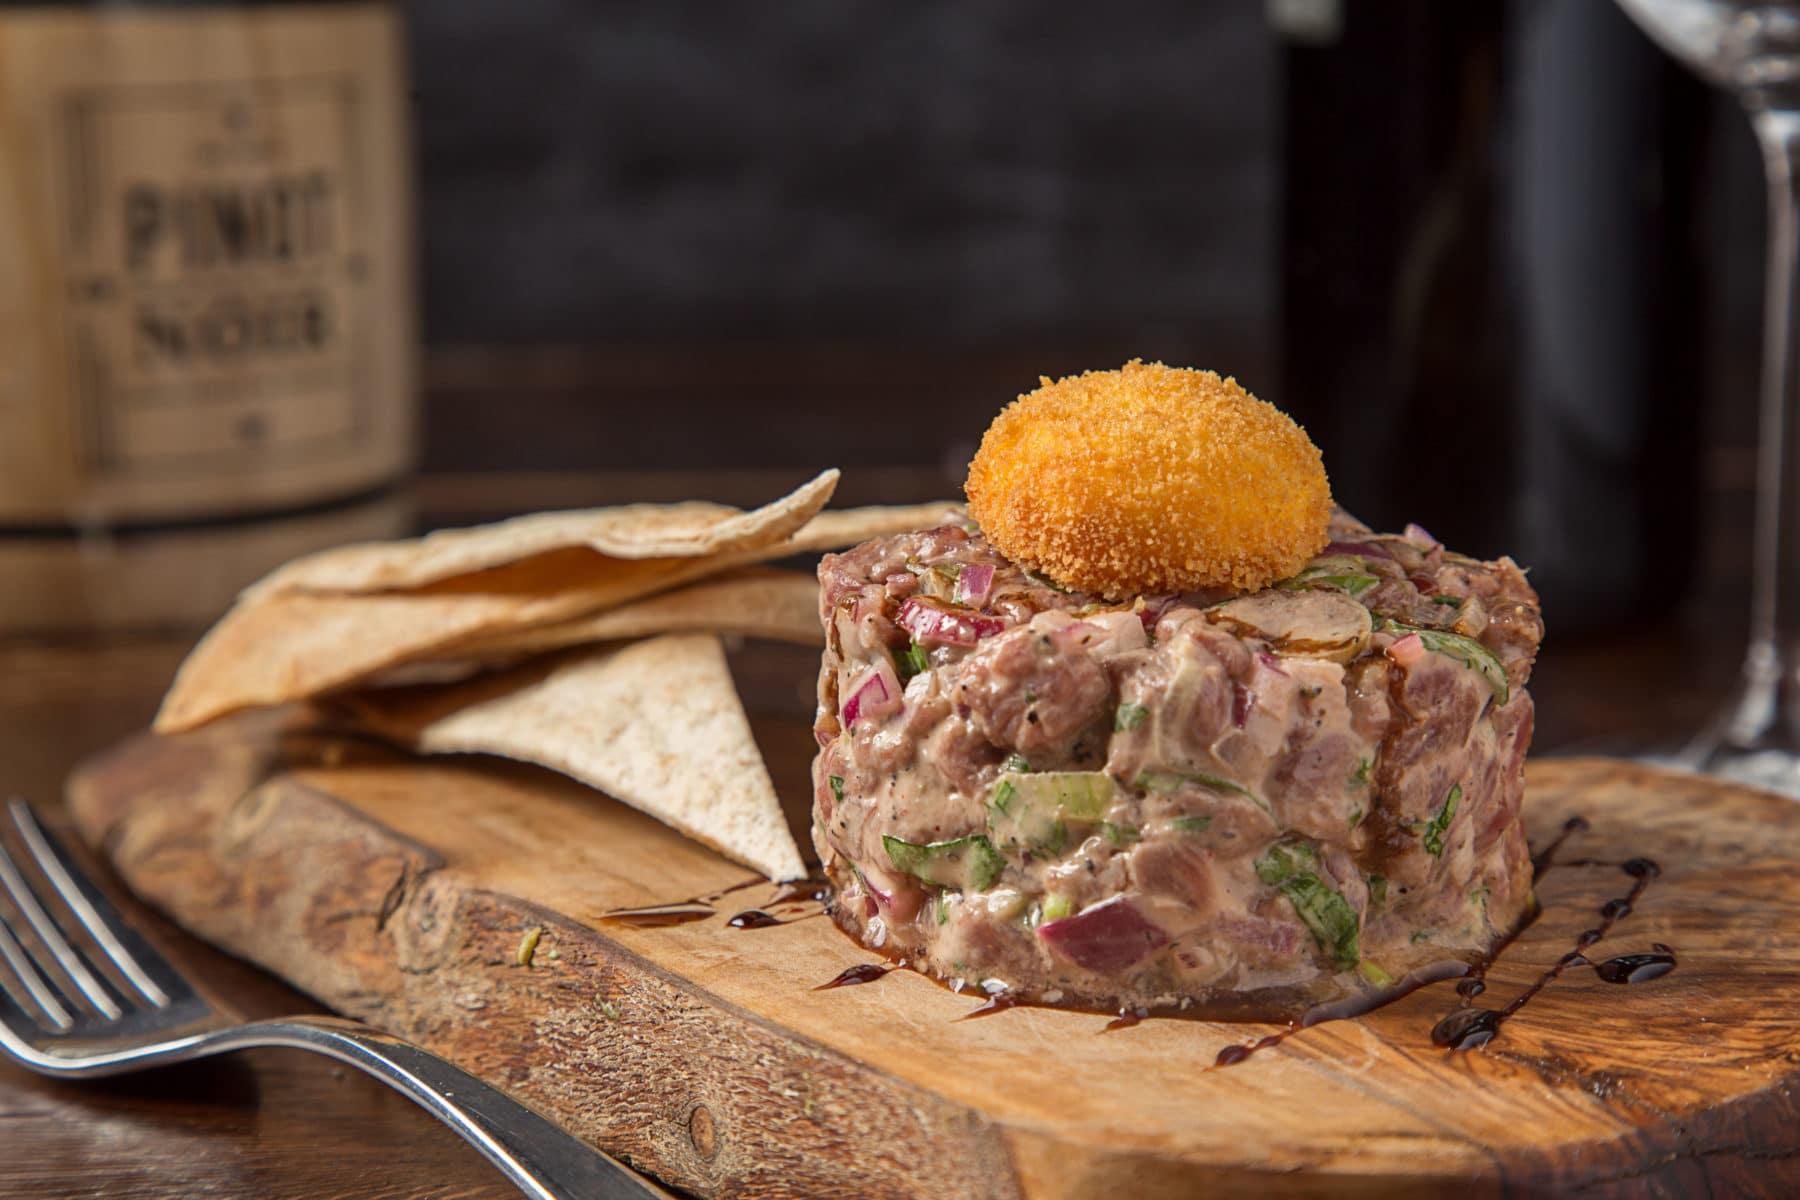 Where to Buy Aventura Miami Kosher Tuna Tartar